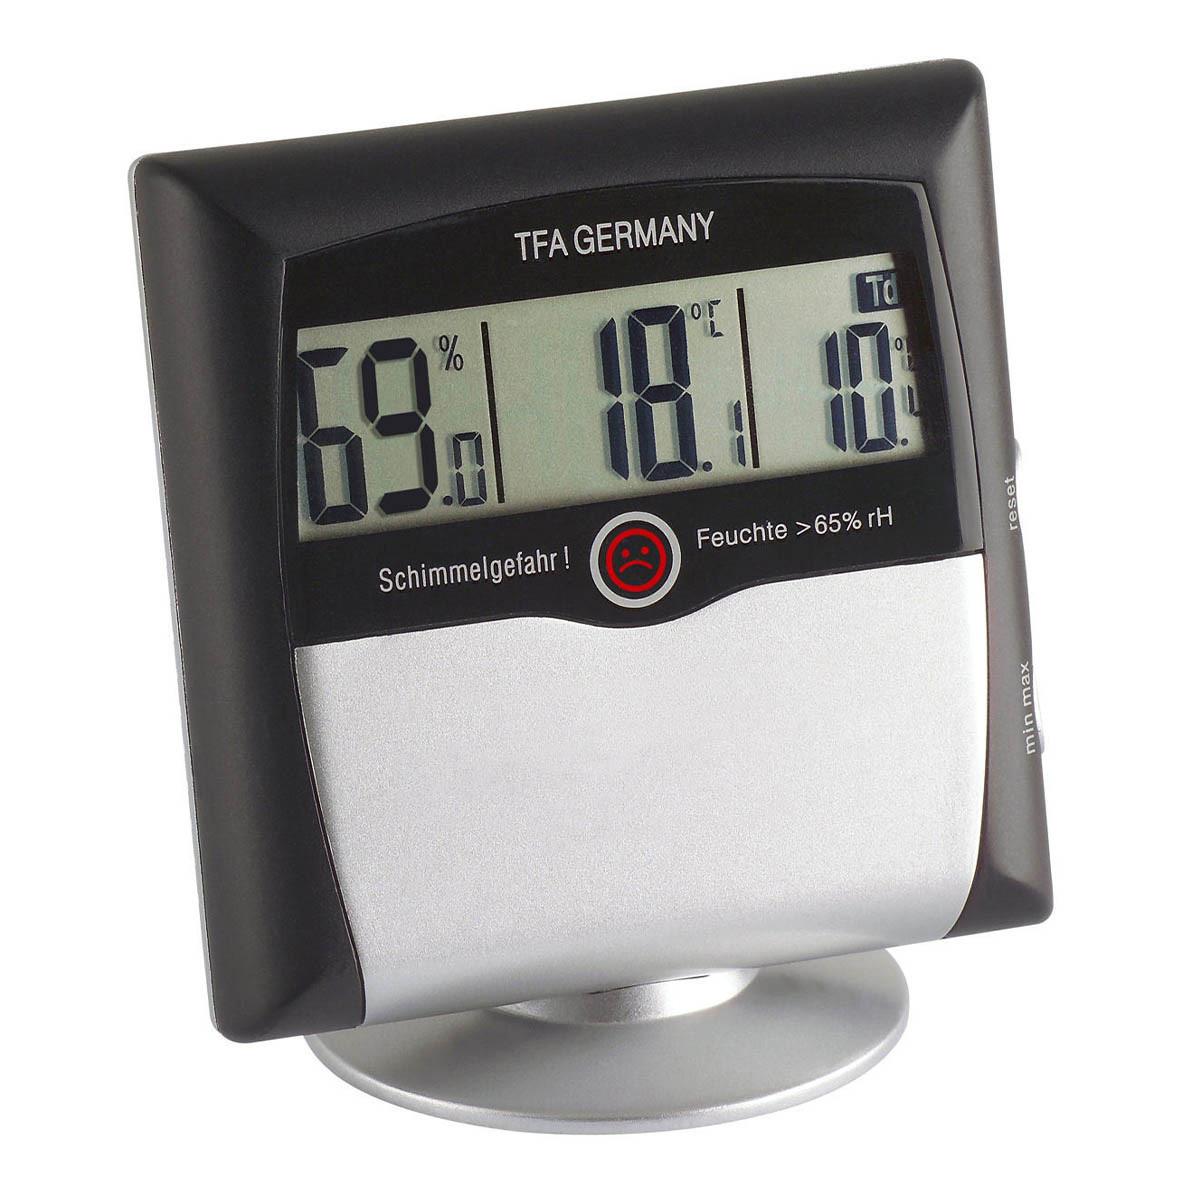 30-5011-digitales-thermo-hygrometer-comfort-control-1200x1200px.jpg